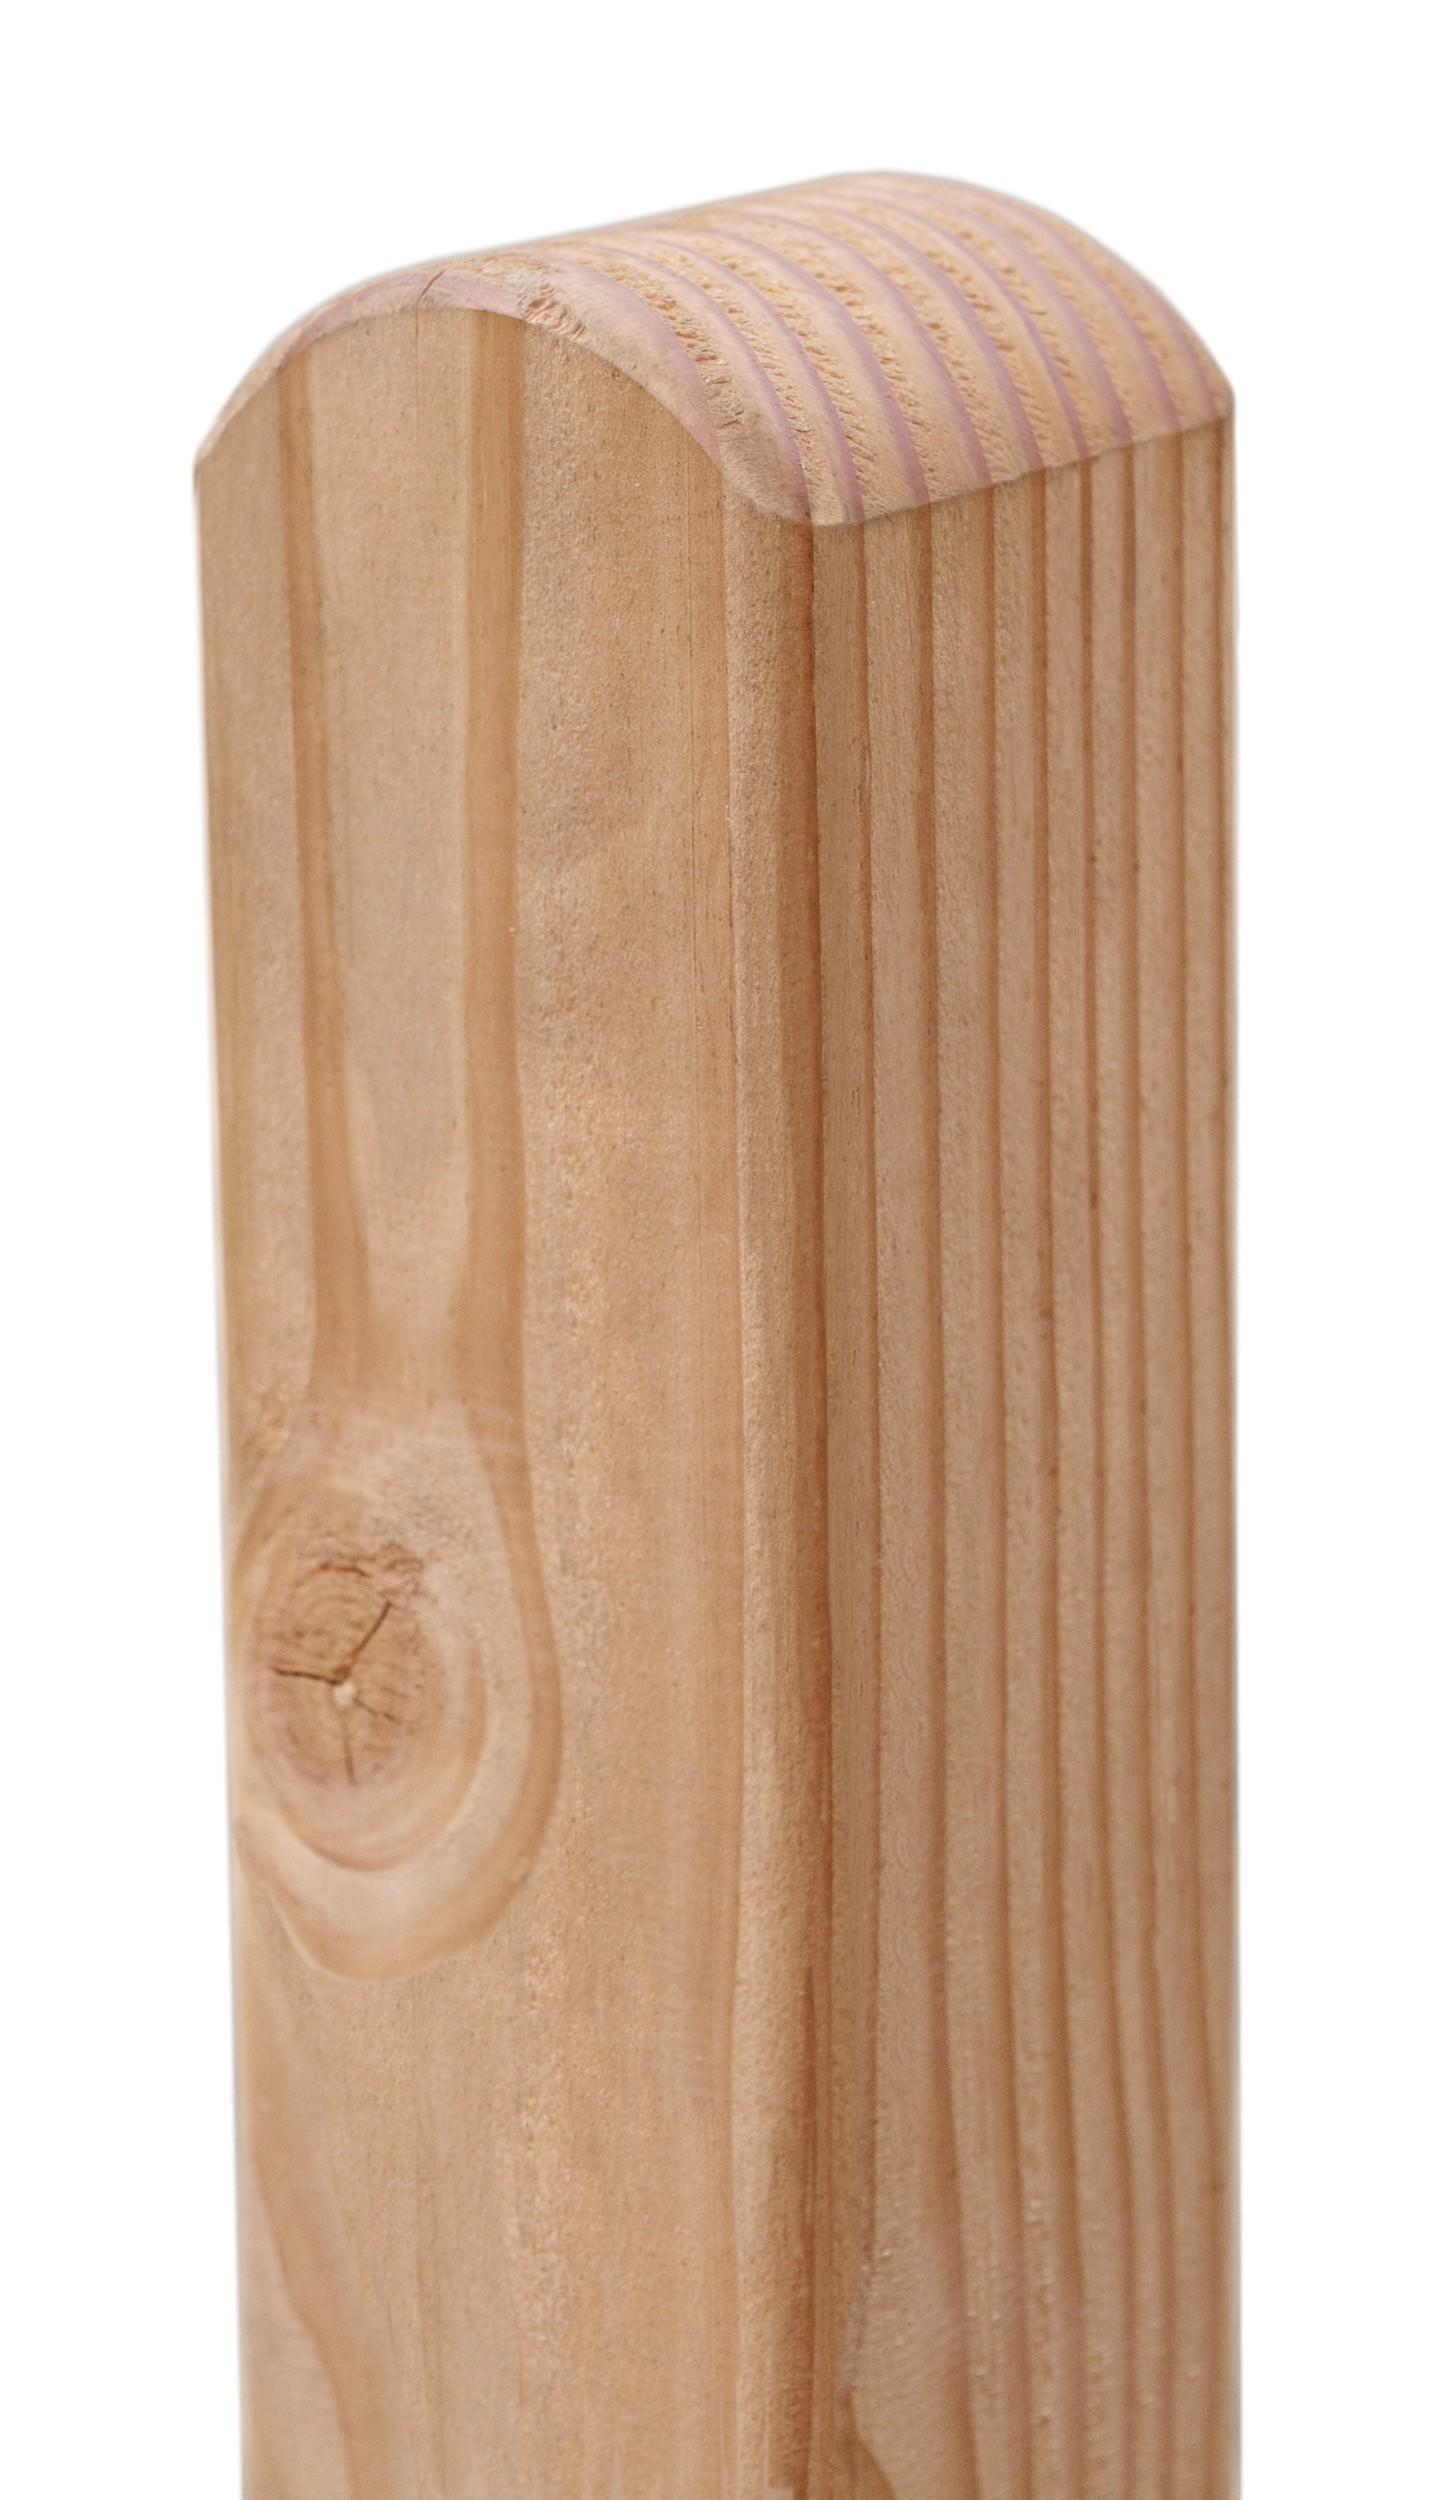 Zaunpfosten pfosten rundkopf l rche natur 9x9cm l 190cm for Sichtschutzzaun sina